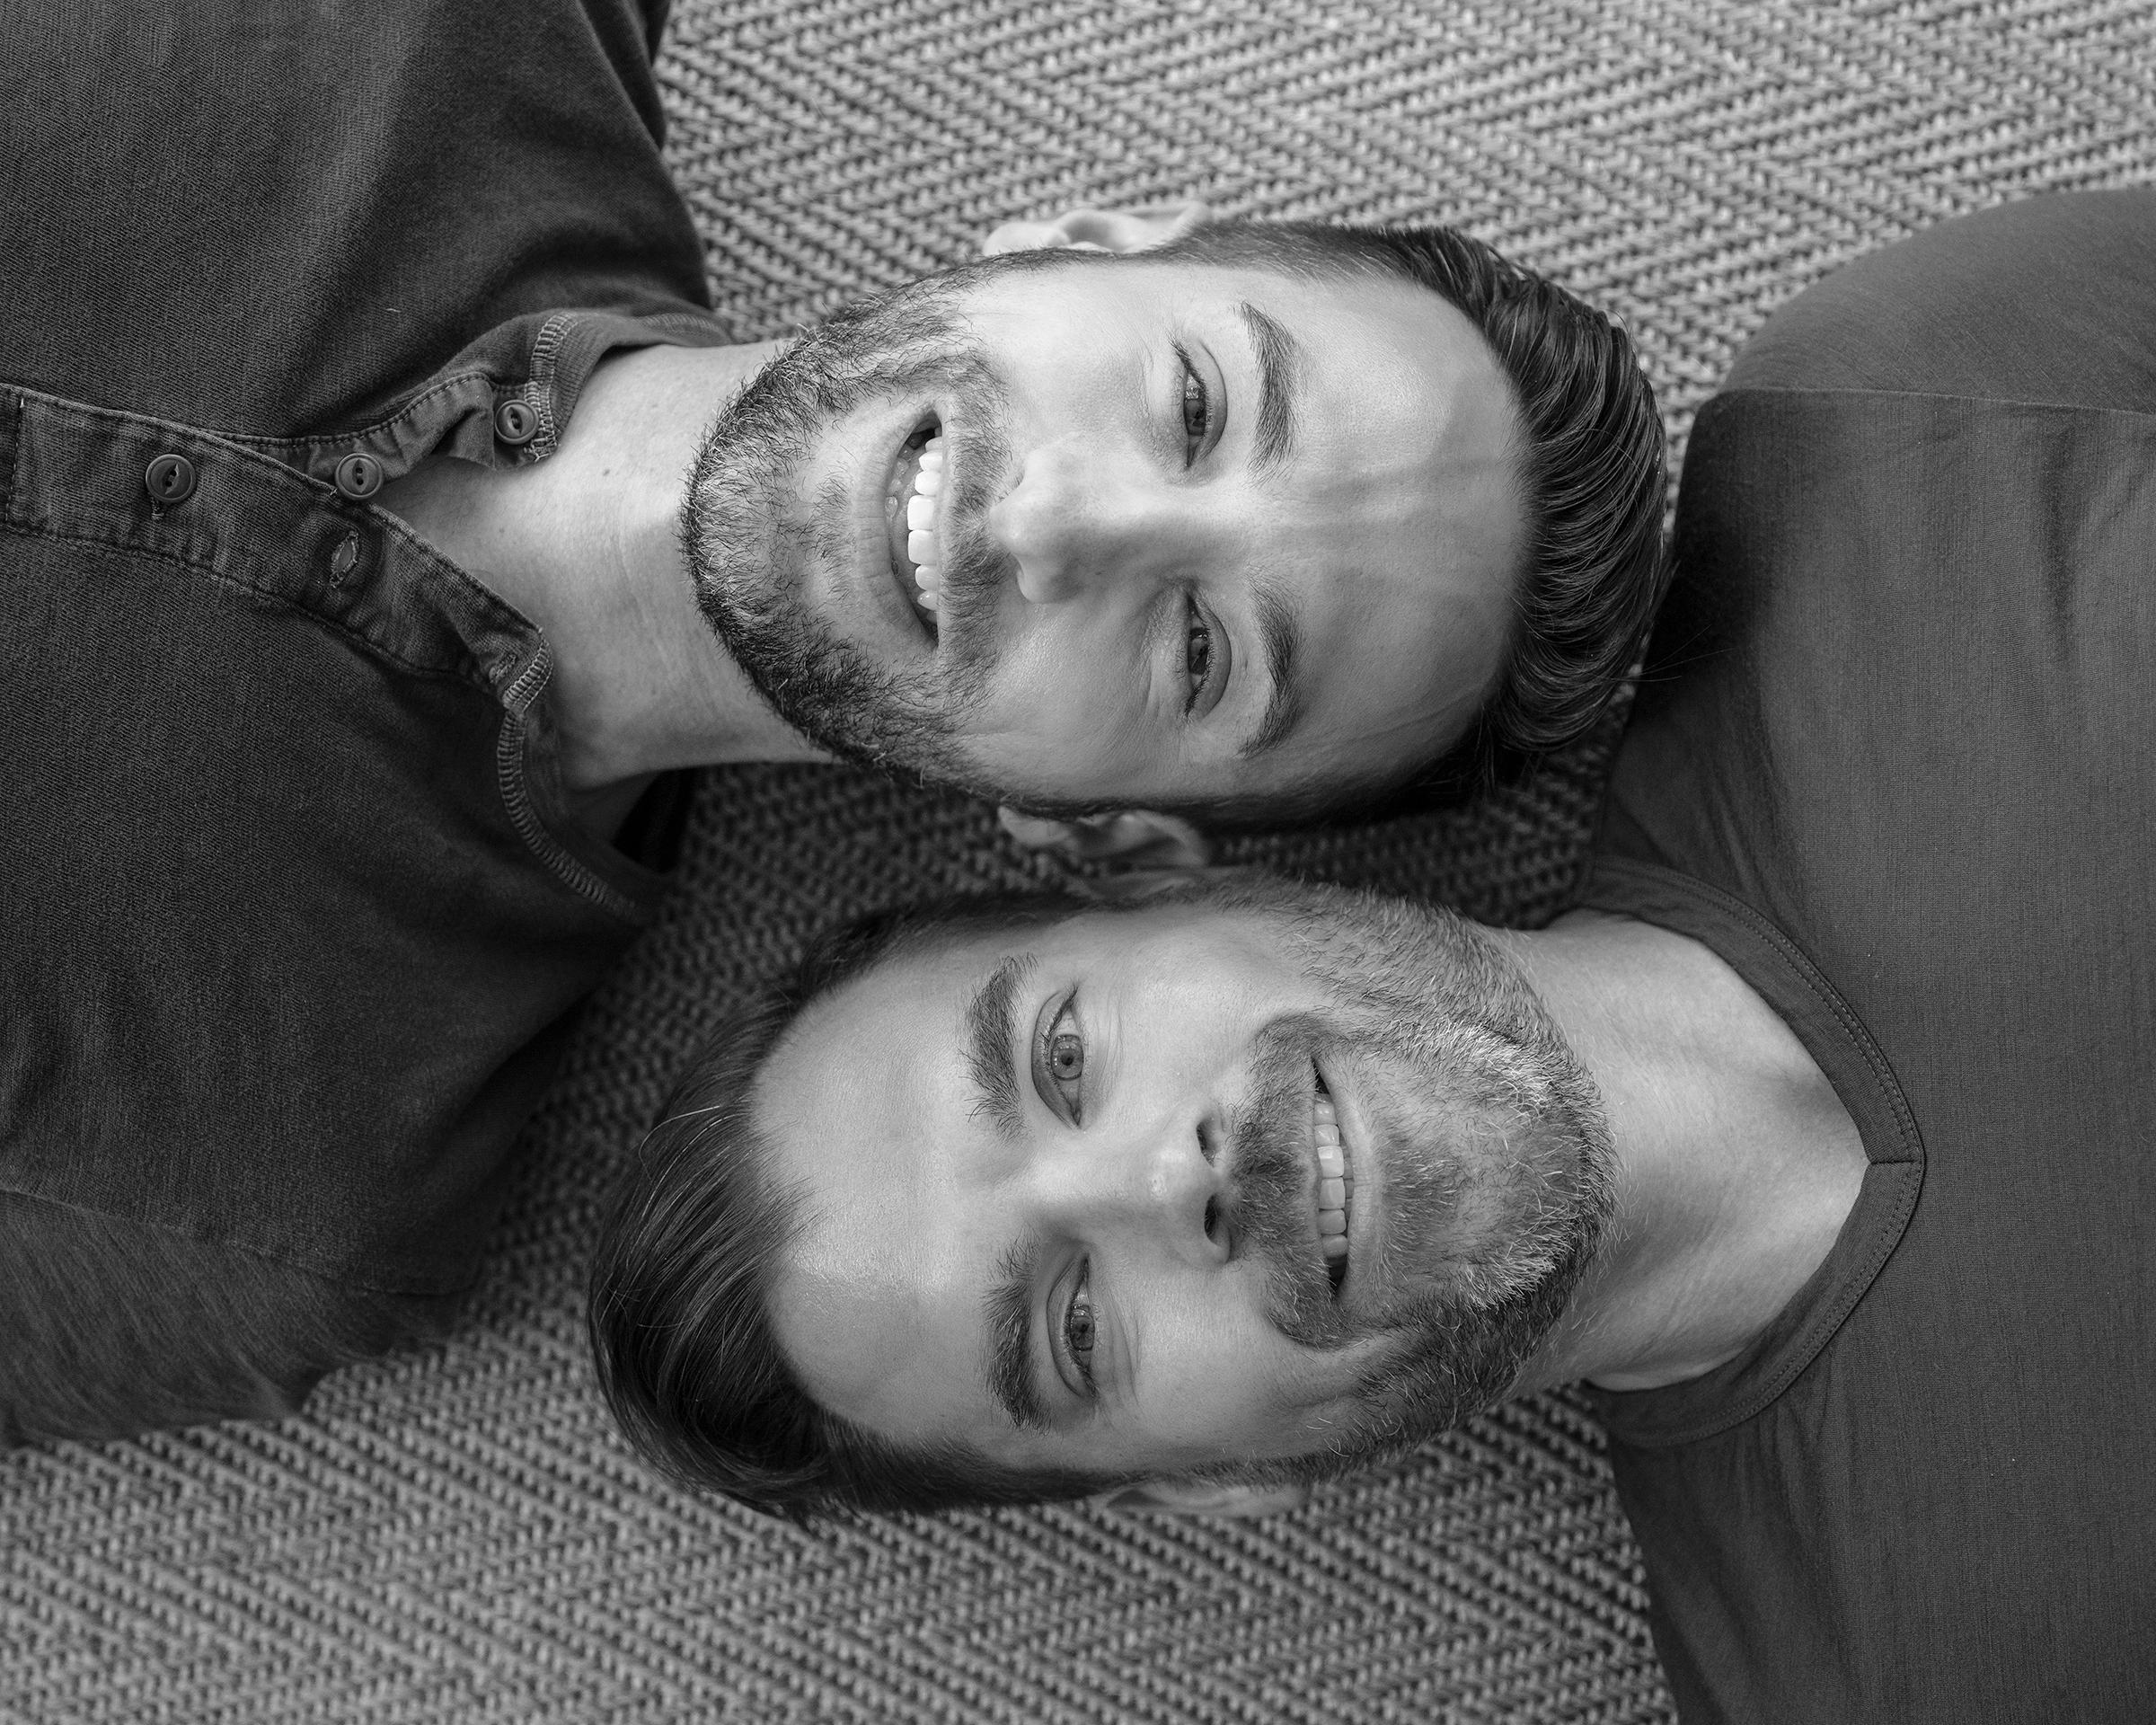 Adam-and-Steve-Portraits-DSCF2433.jpg